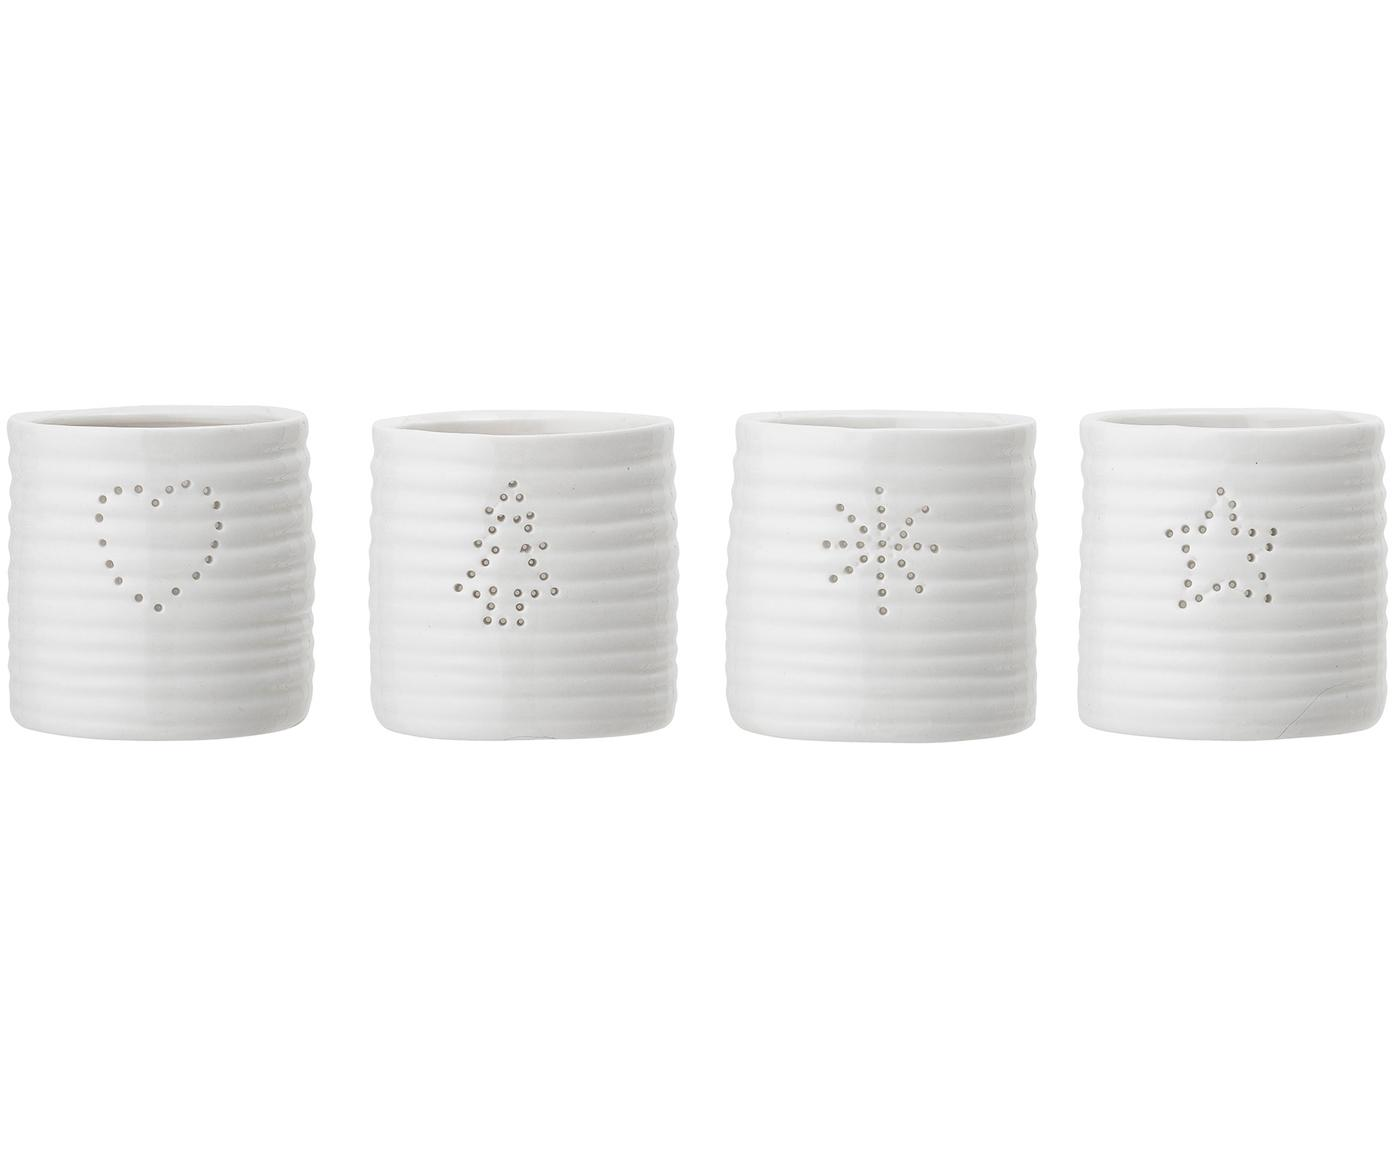 Set 4 portalumini Sara, Terracotta, Bianco, Ø 7 x Alt. 7 cm